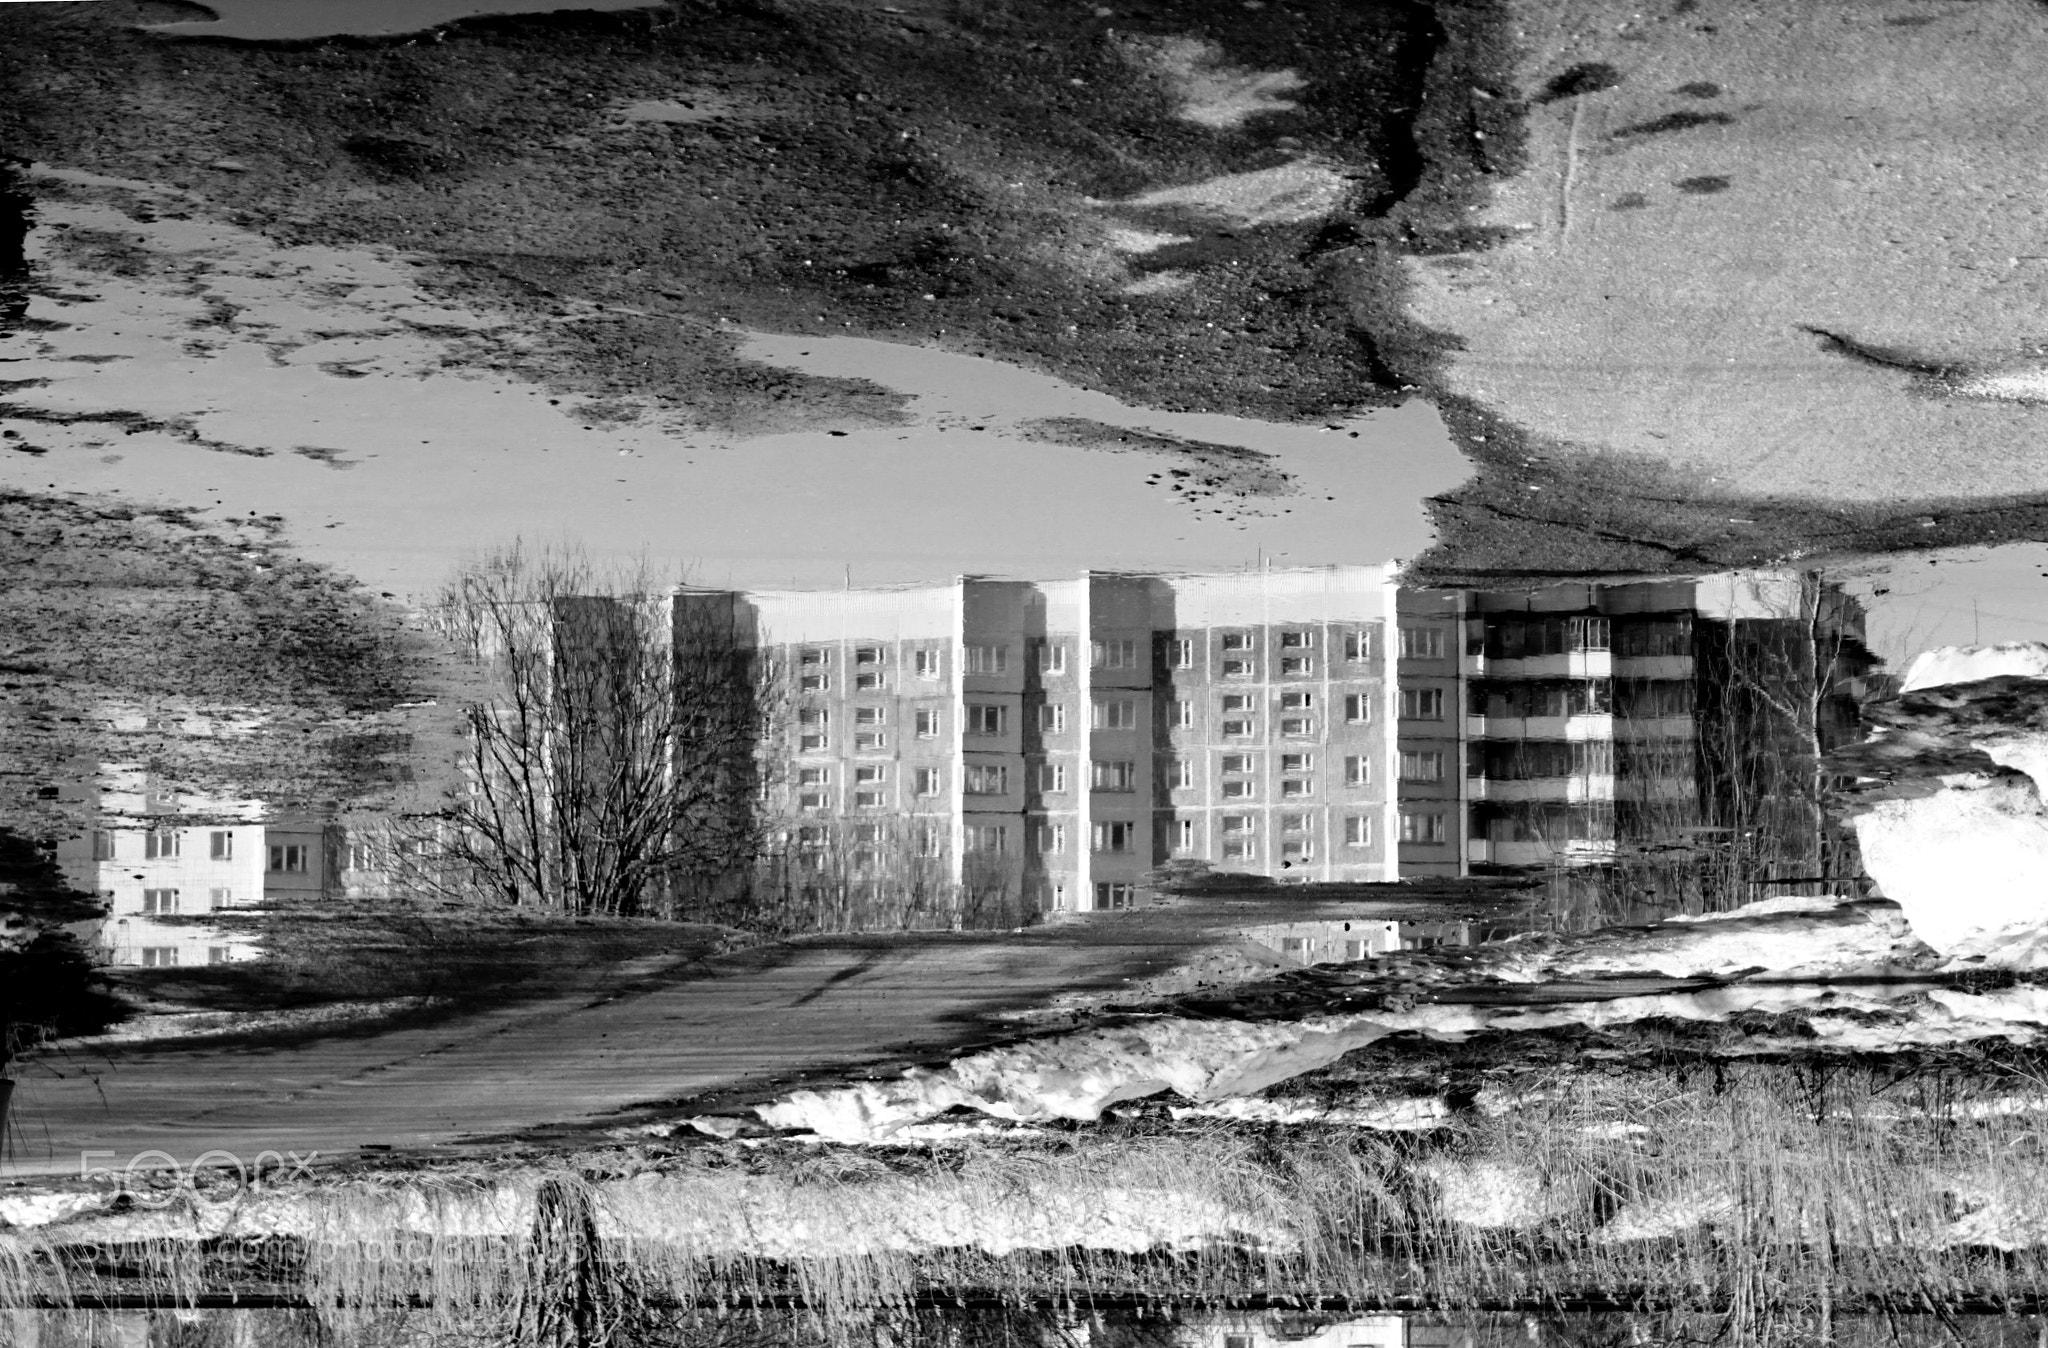 Photograph Untitled by Arisha Malygina on 500px